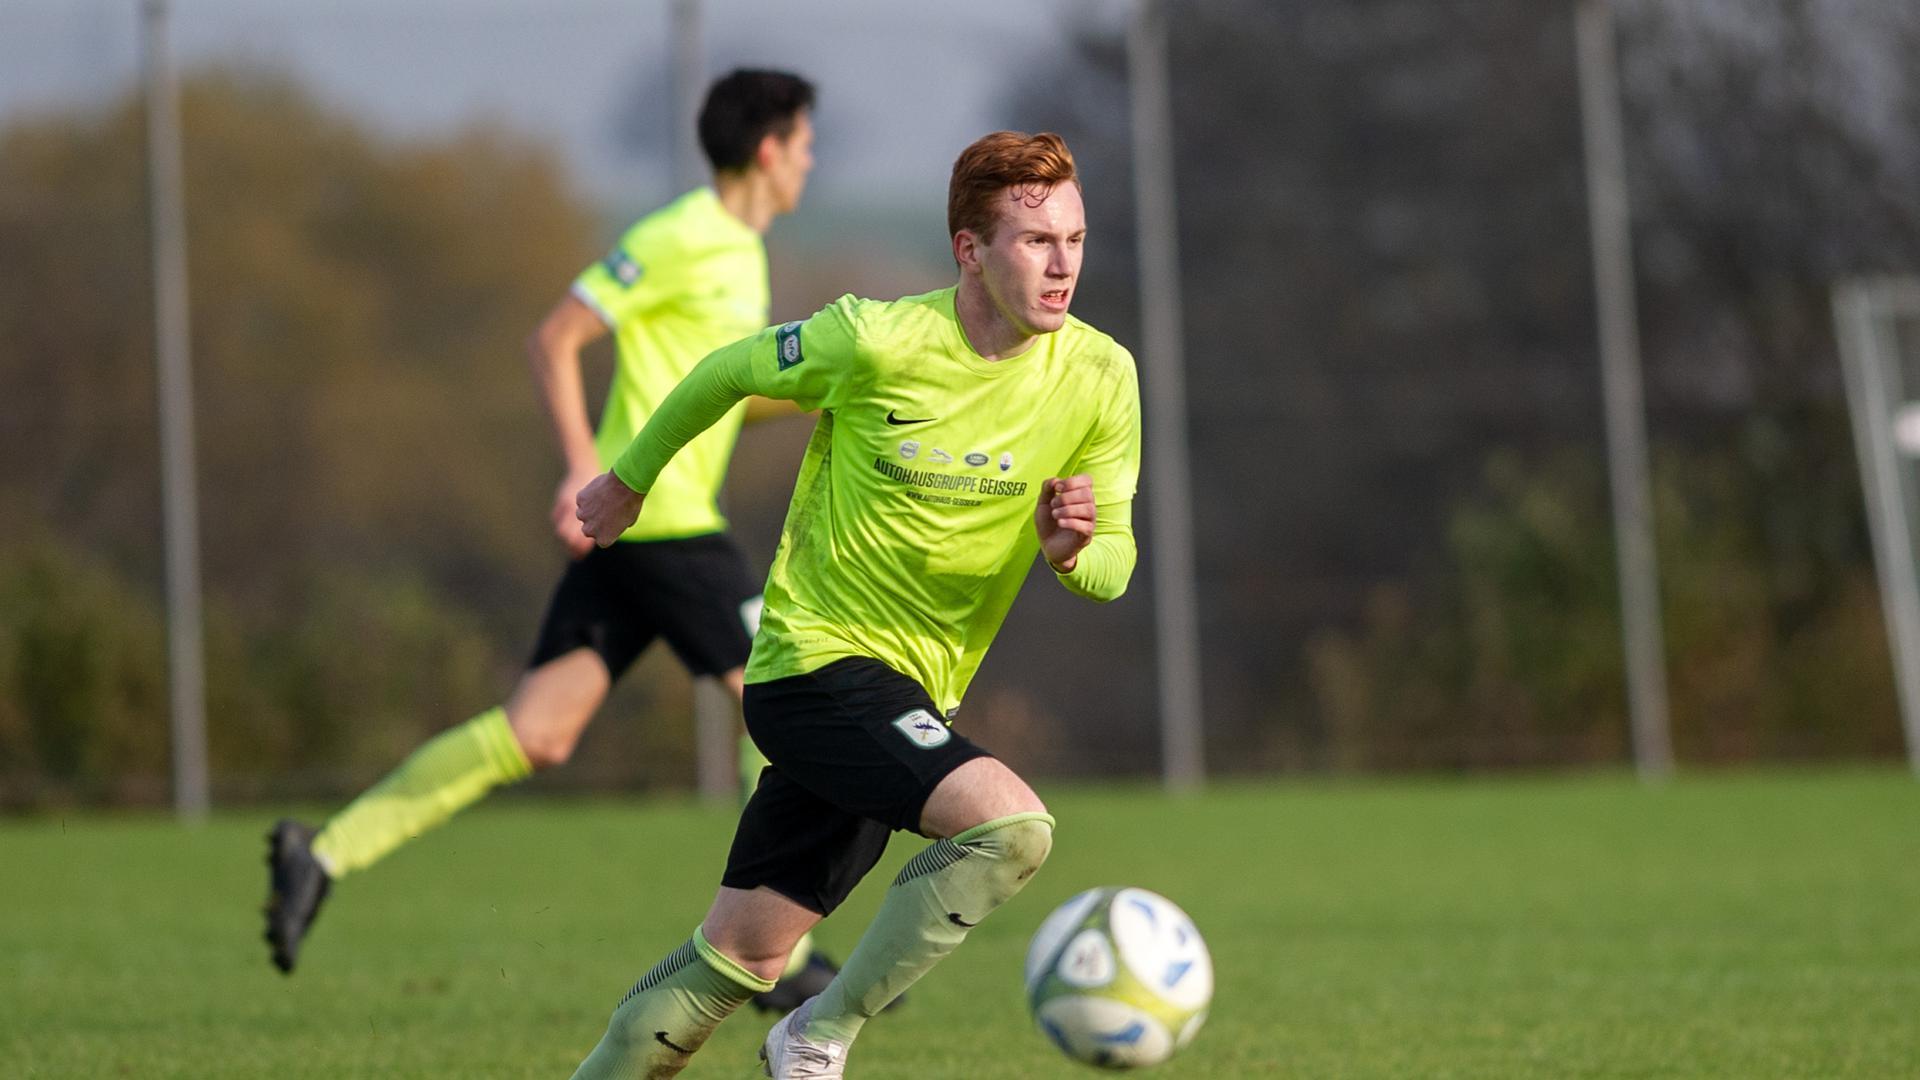 David Pruetting (Palmbach)  GES/ Fussball/ SV Langensteinbach 2 - TSV Palmbach. 24.11.2019